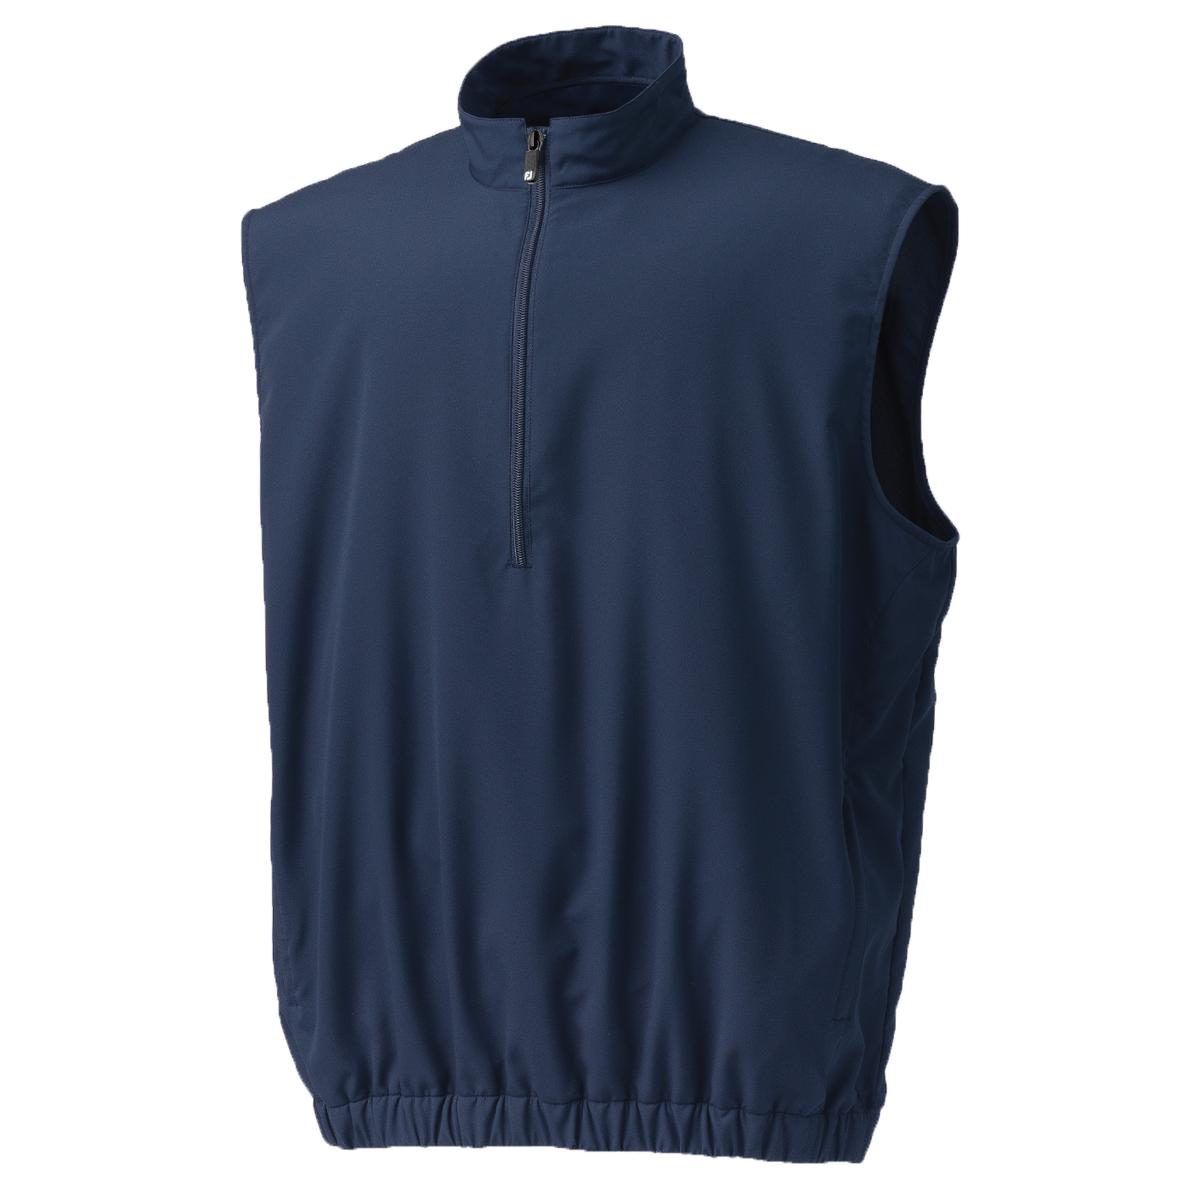 FootJoy Windshirt Vest on